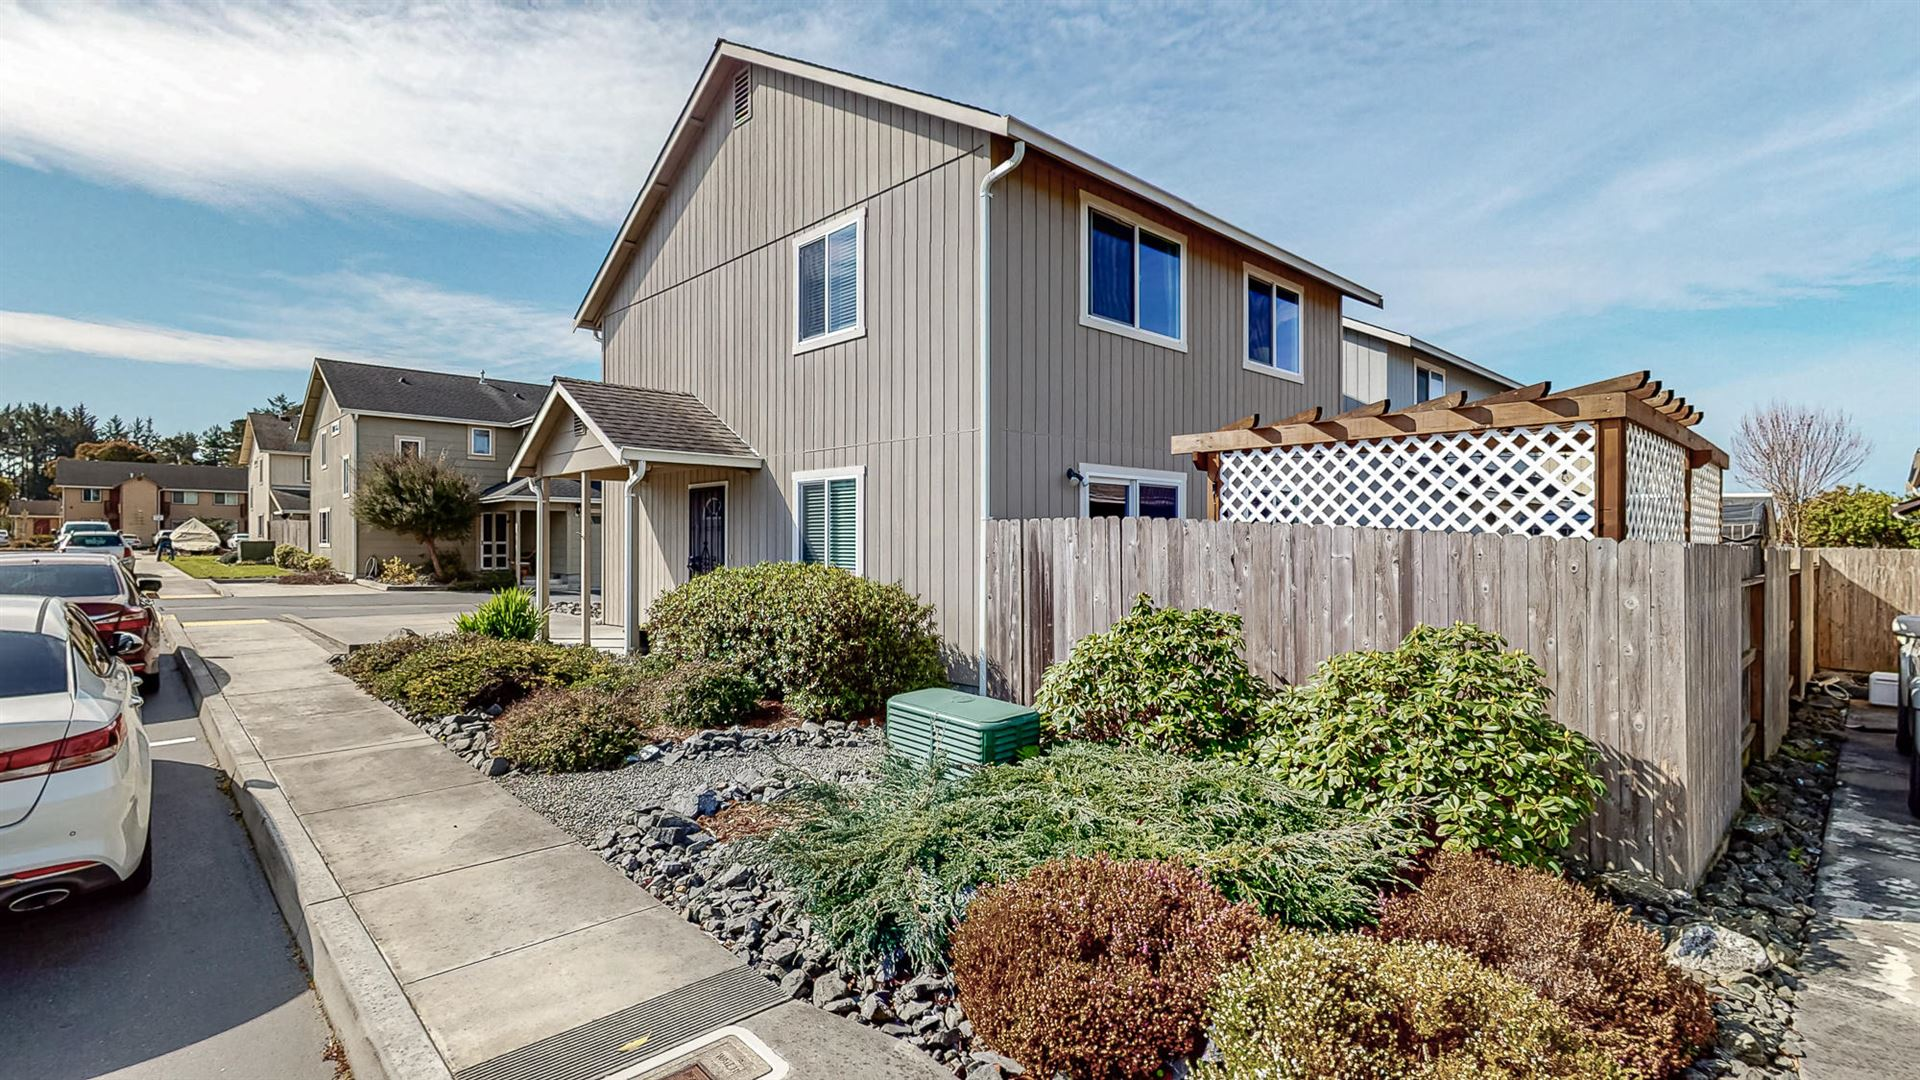 1495 Sandstone Street, McKinleyville, CA 95519 - MLS#: 258639